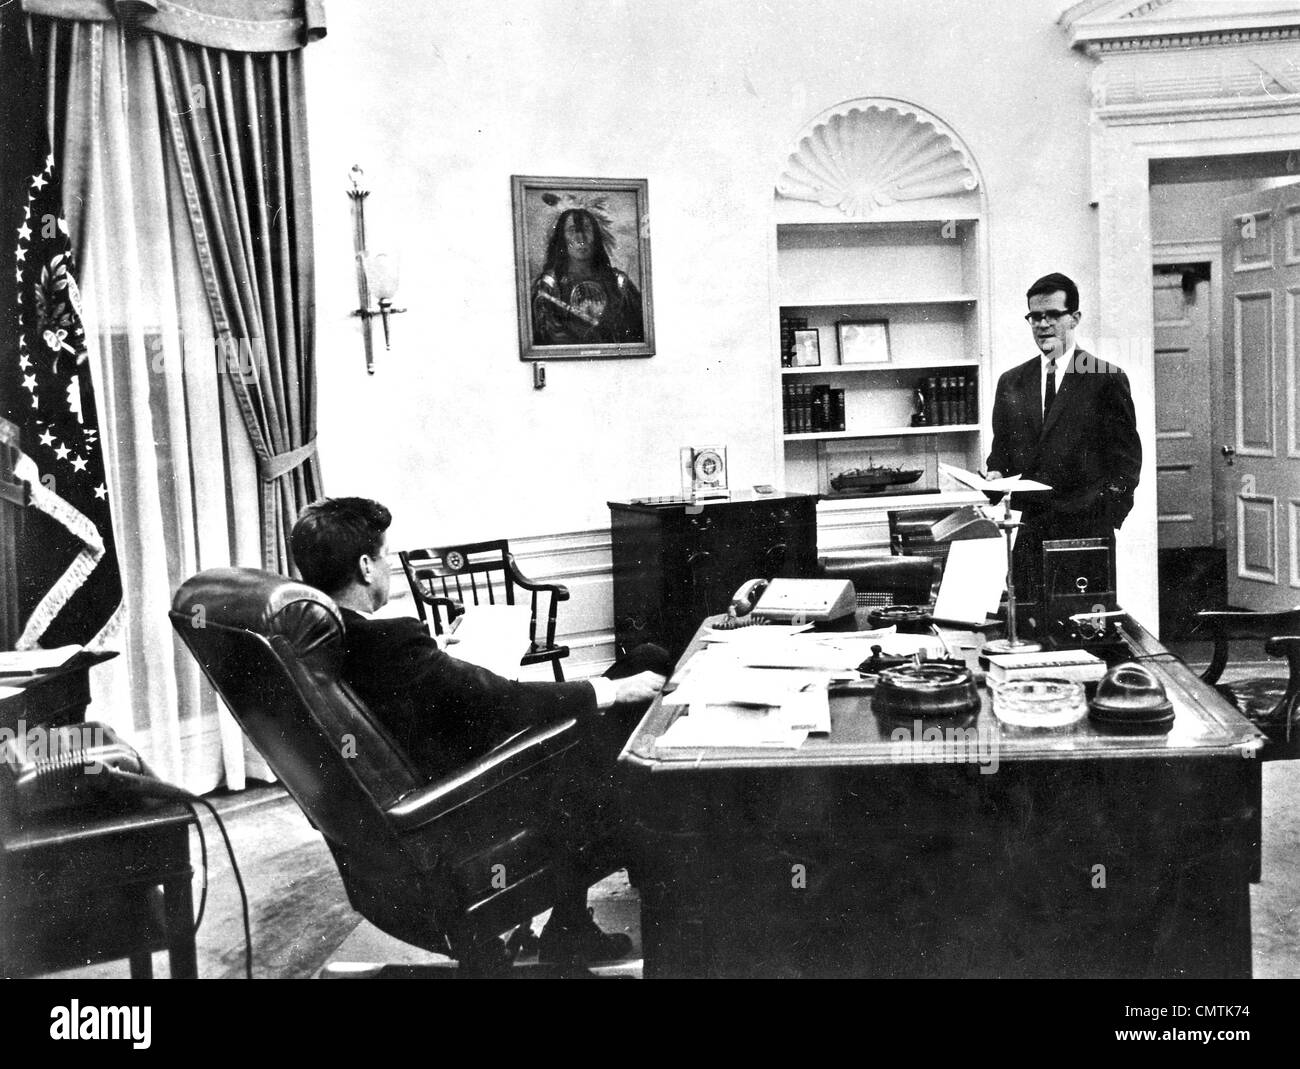 JOHN F KENNEDY U.S. Präsident im Weißen Haus Oval Office mit Berater Theodore Sorensen Ion 1962 Stockbild